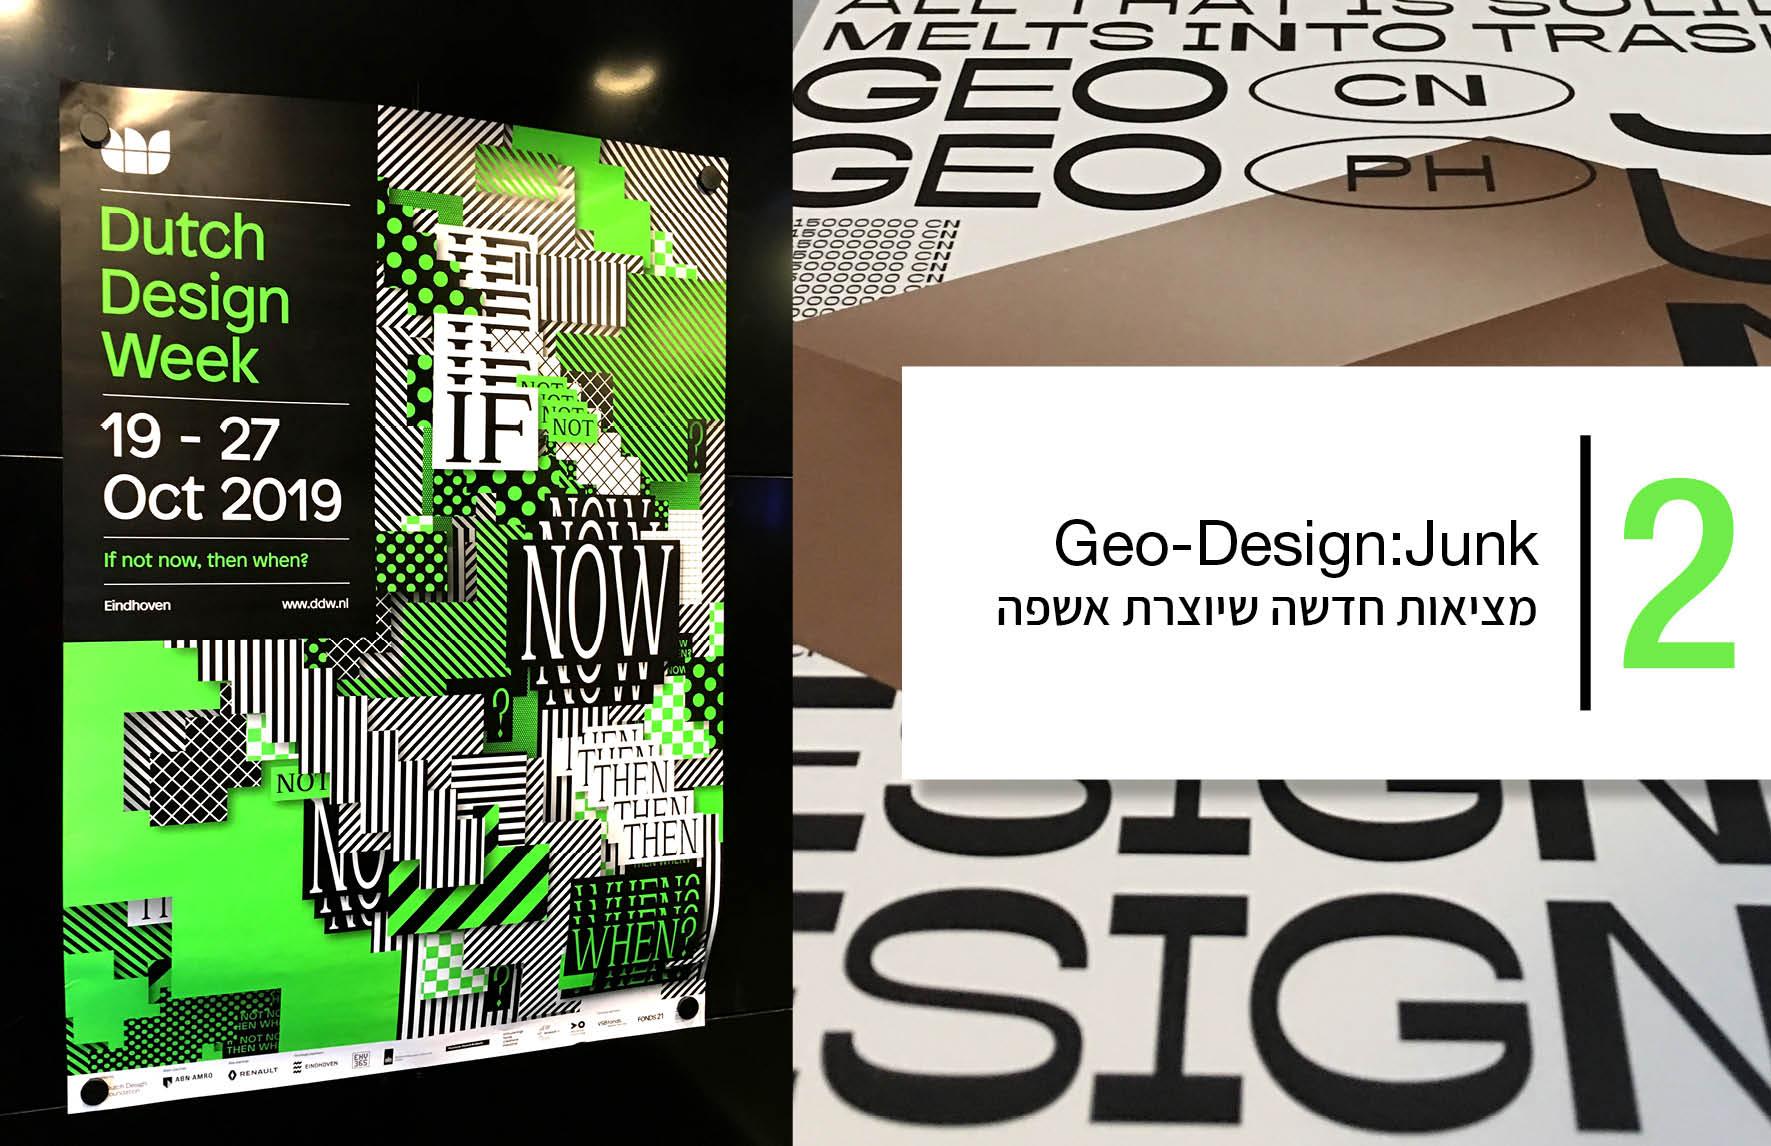 Geo-Design:Junk - מציאות חדשה שיוצרת אשפה